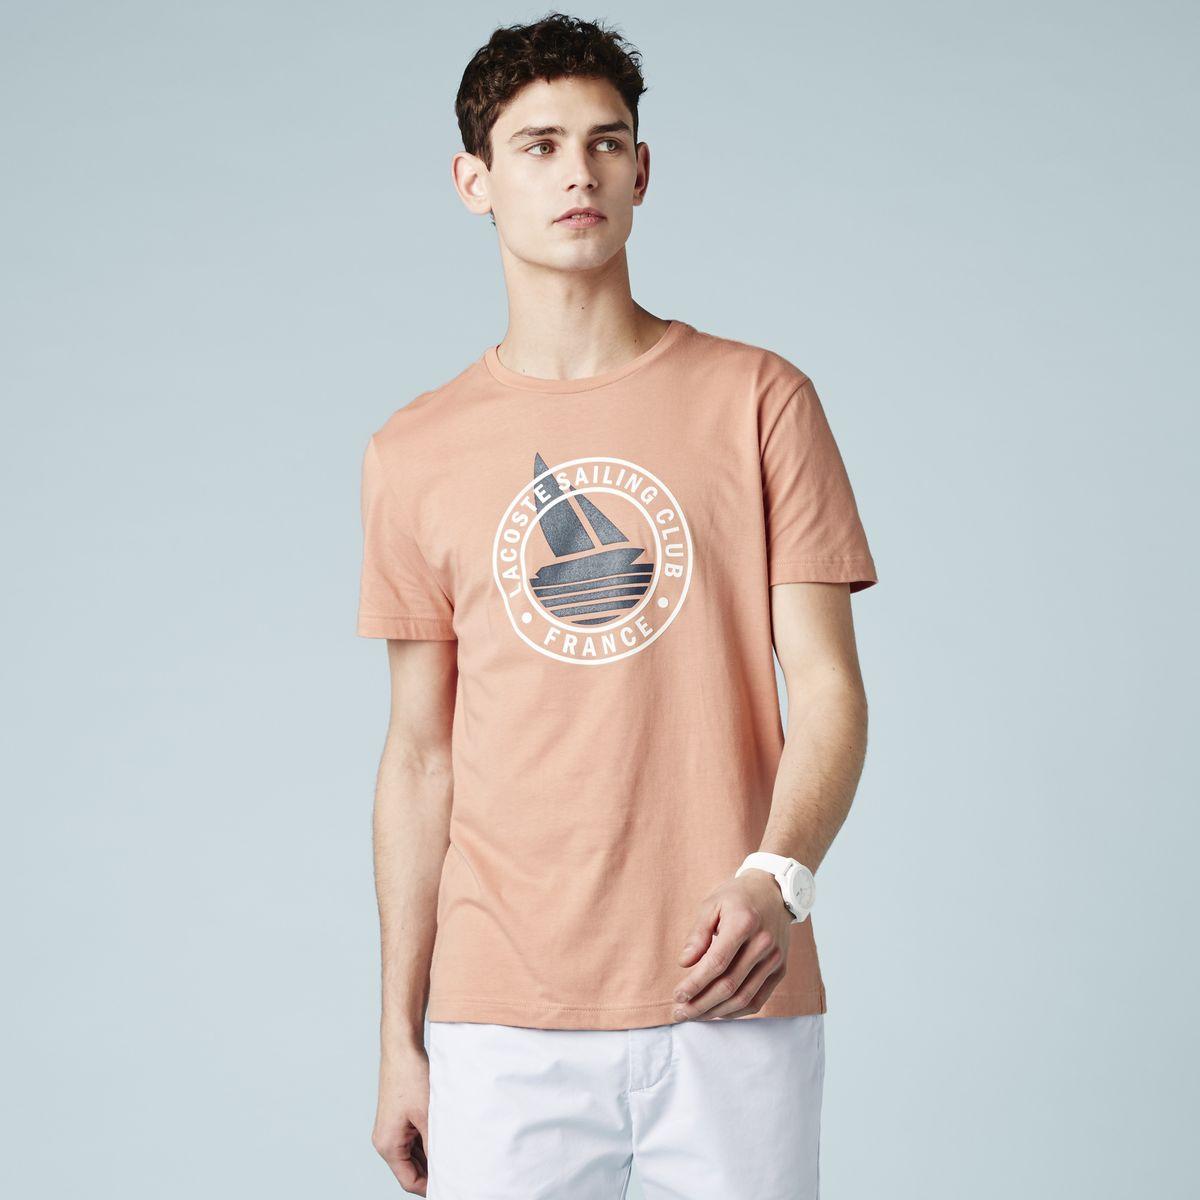 Футболка мужская Lacoste th96509ami1 lacoste футболка lacoste модель 25628633